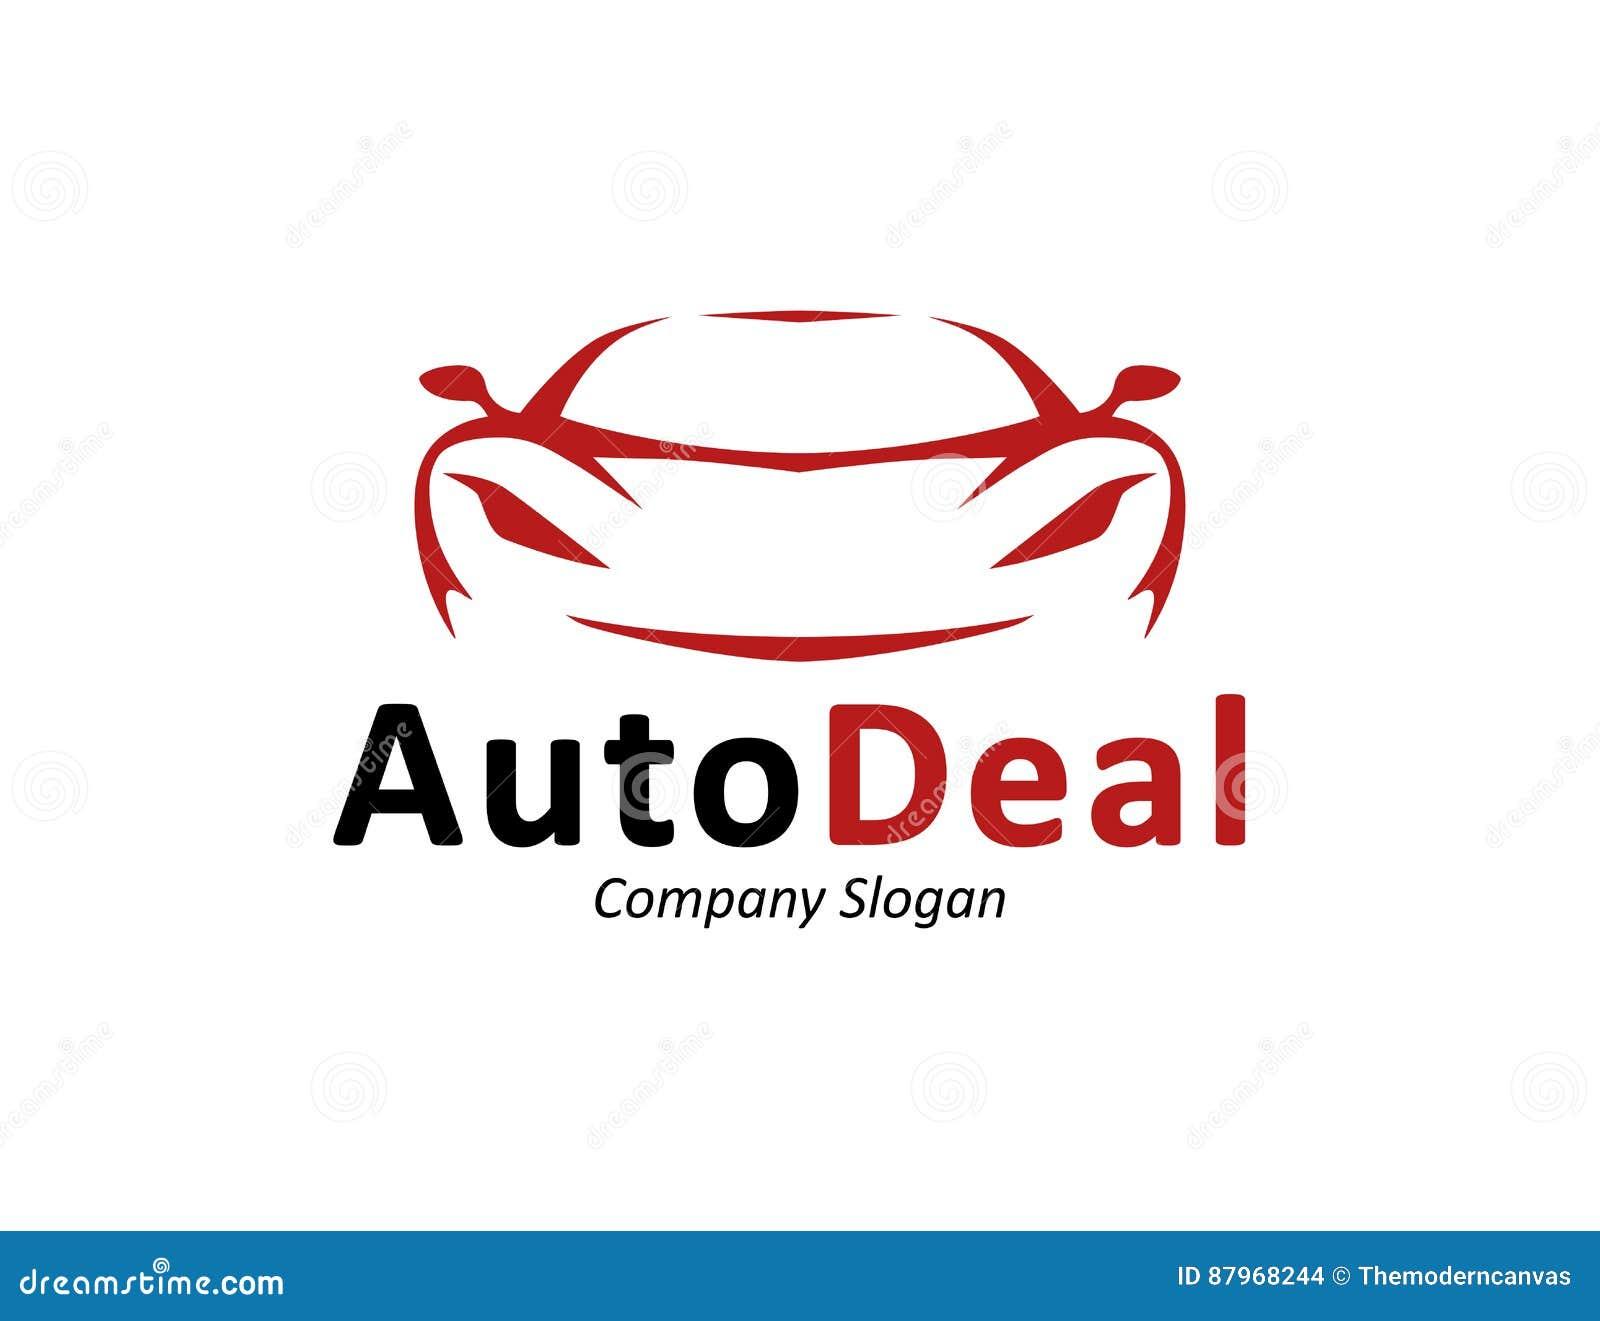 Auto Car Dealership Logo Design With Concept Sports